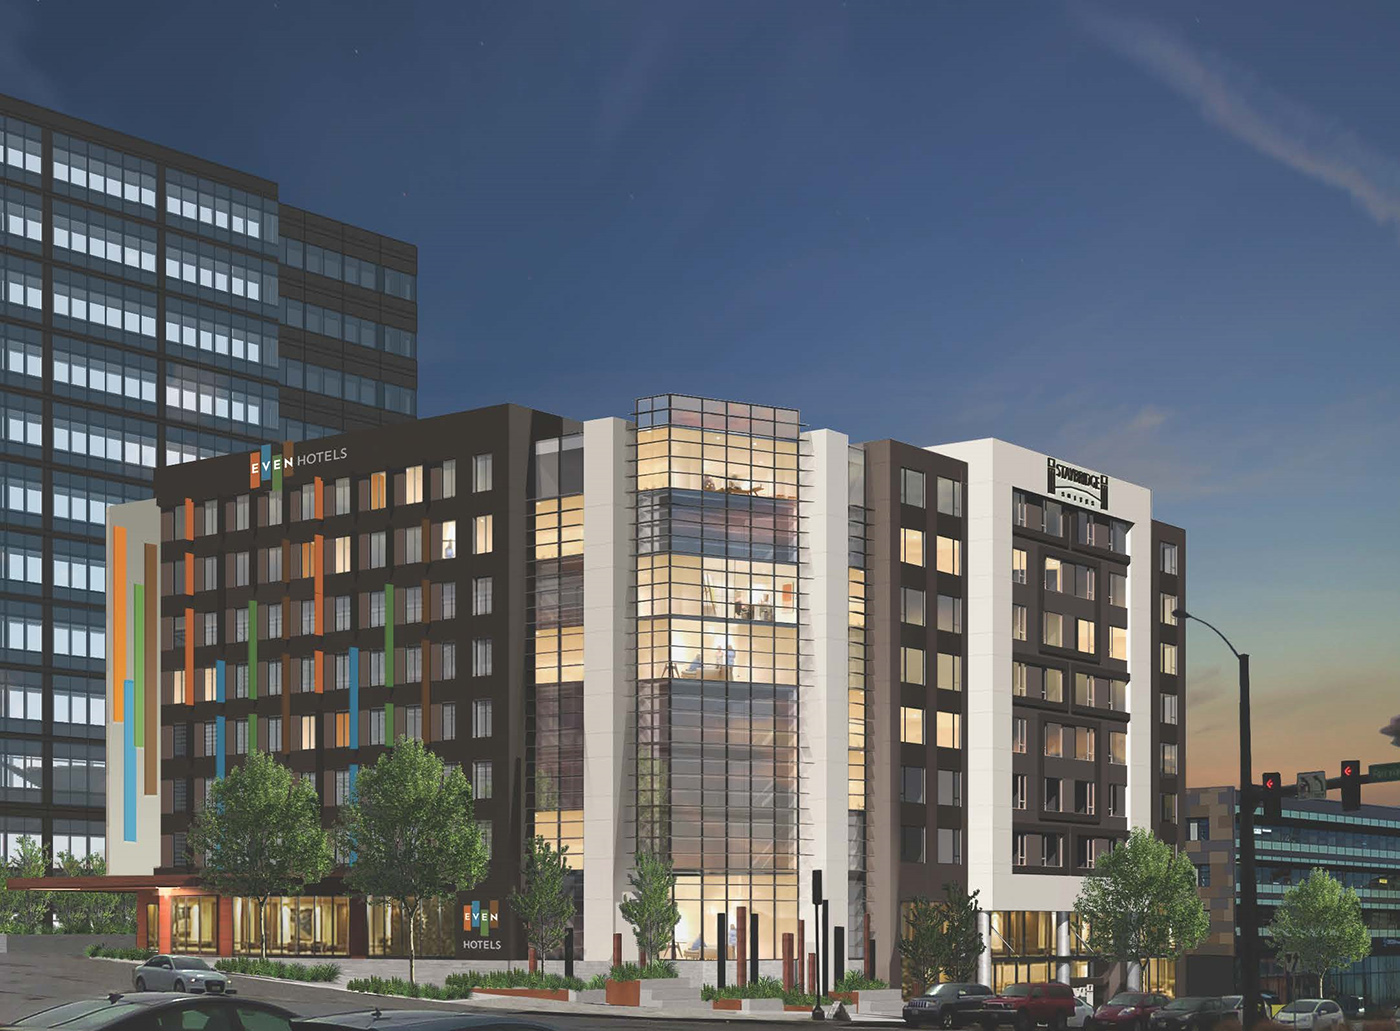 Seattle DJCcom local business news and data  Real Estate  IHG Noble partner on Mercer and